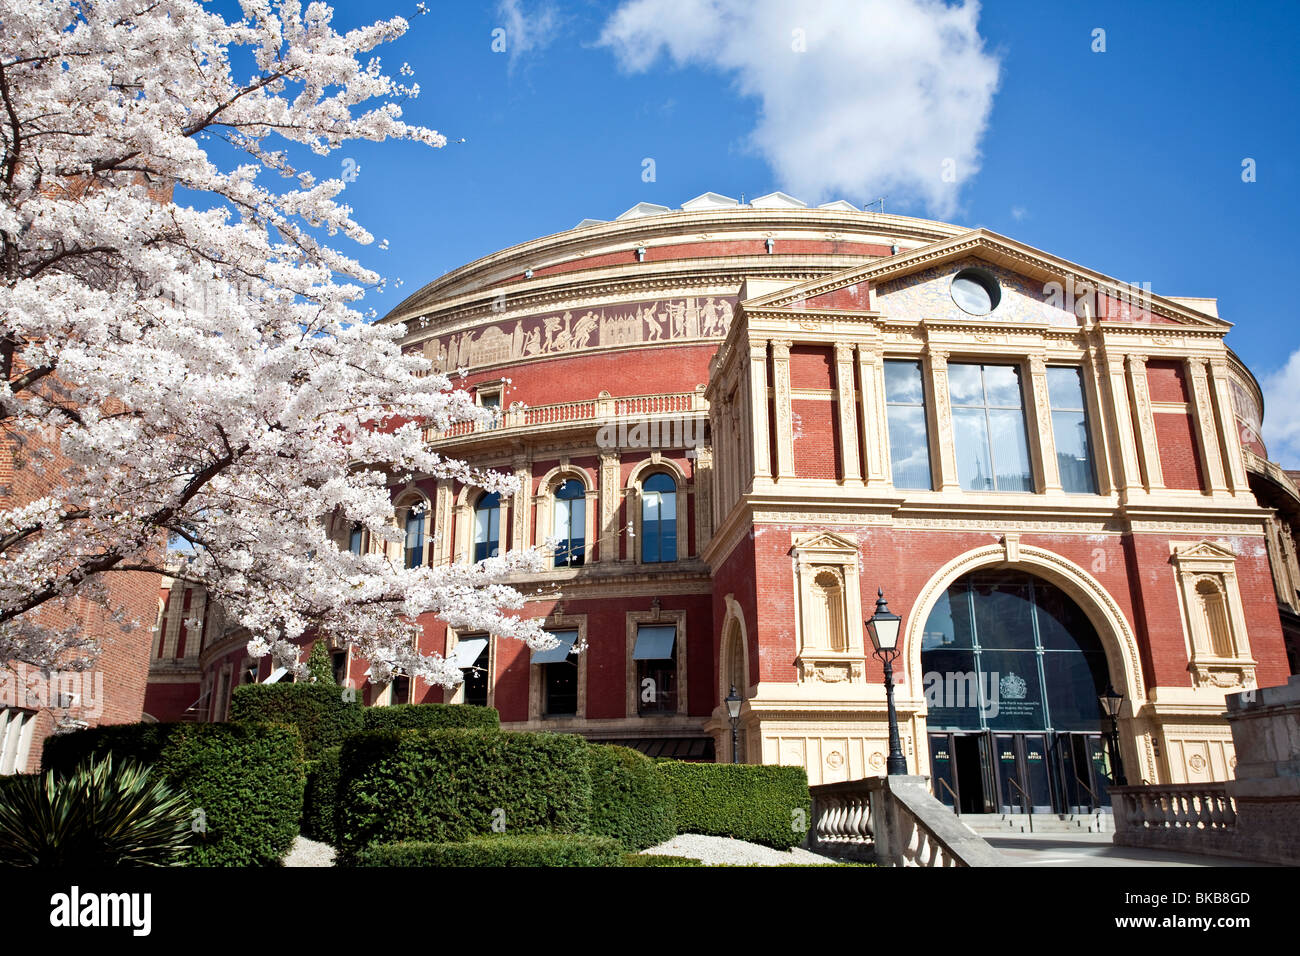 The Royal Albert Hall, Kensington, London, England, UK - Stock Image